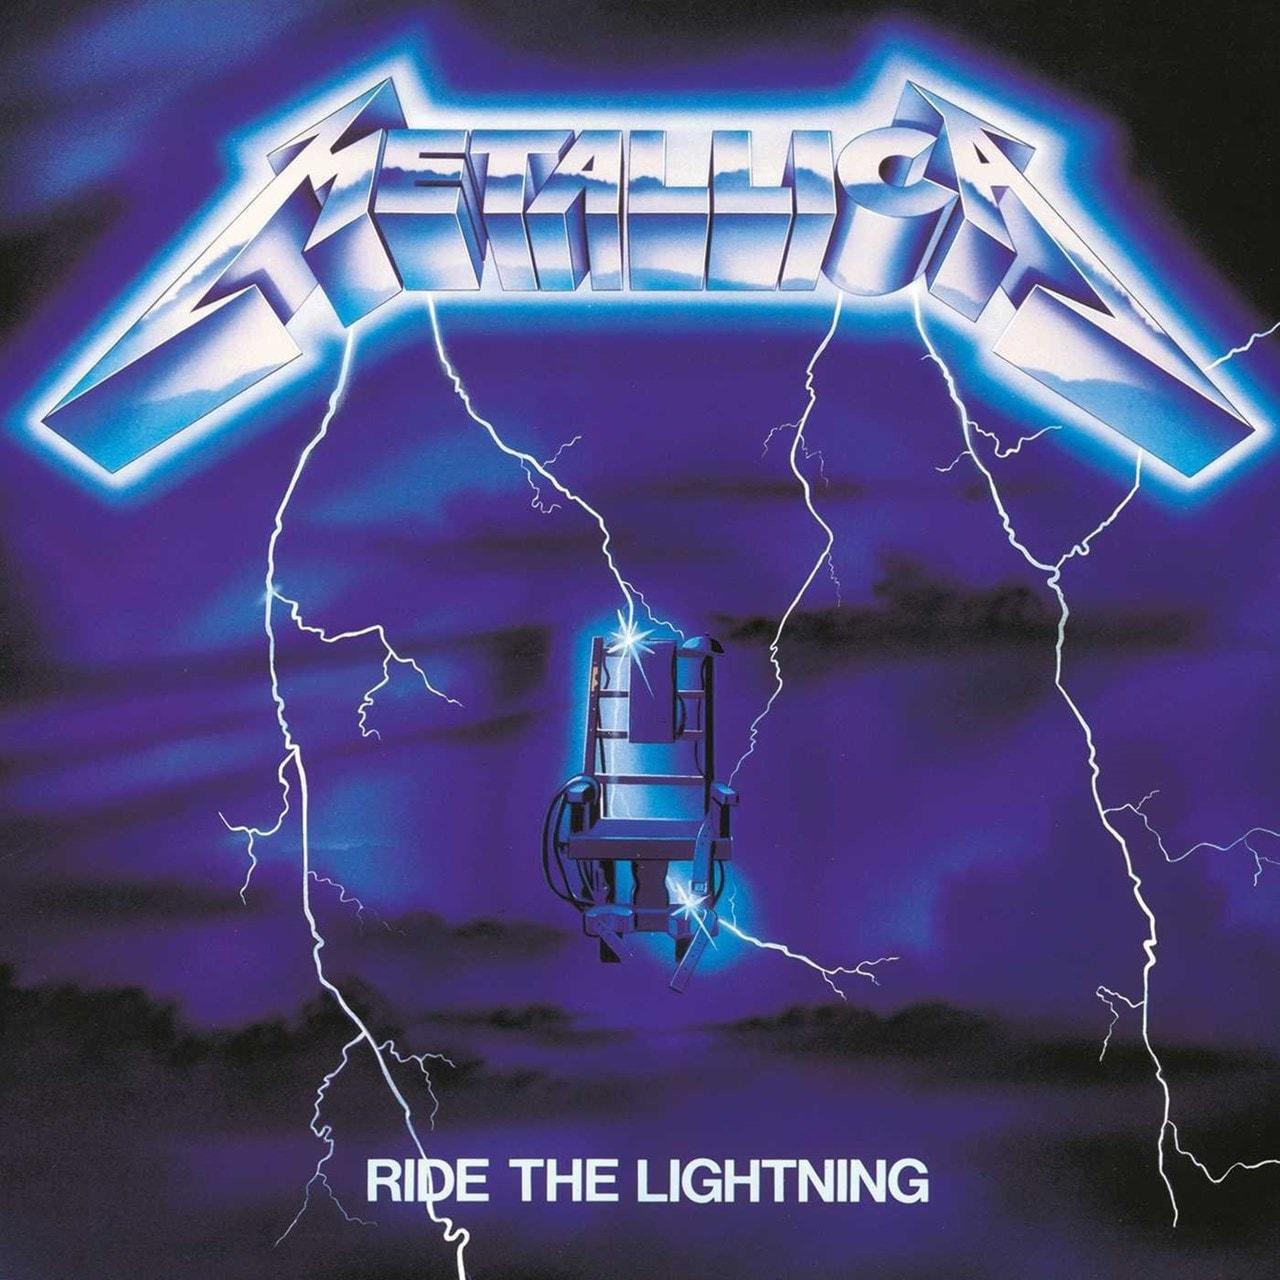 Ride the Lightning - 1